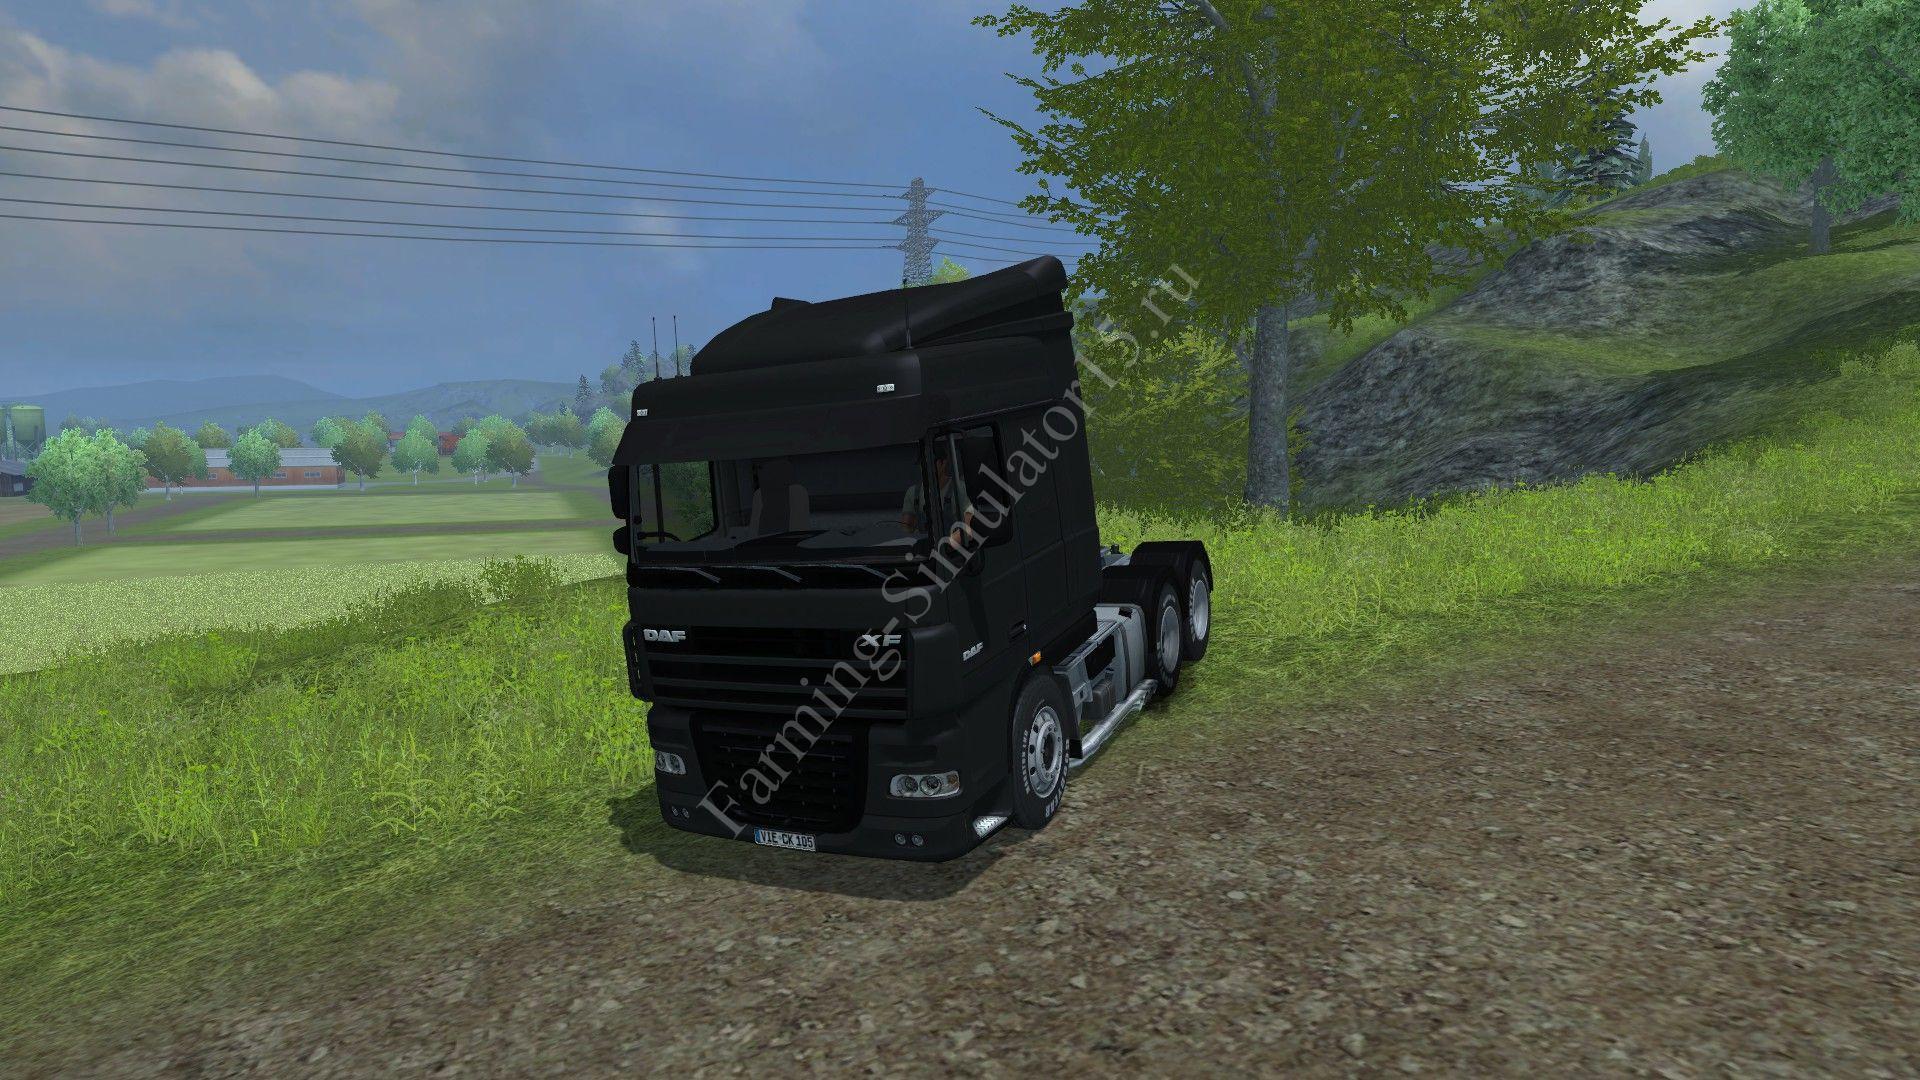 Мод грузовика Daf XF 105 510 v 1.1 Farming Simulator 2013, Farming Simulator 13